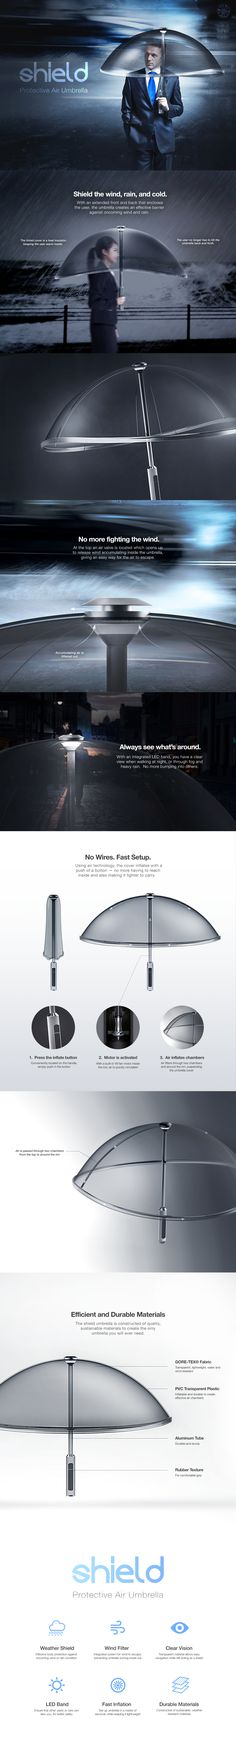 "查看此 @Behance 项目:""Shield Air Umbrella""https://www.behance.net/gallery/56384333/Shield-Air-Umbrella"